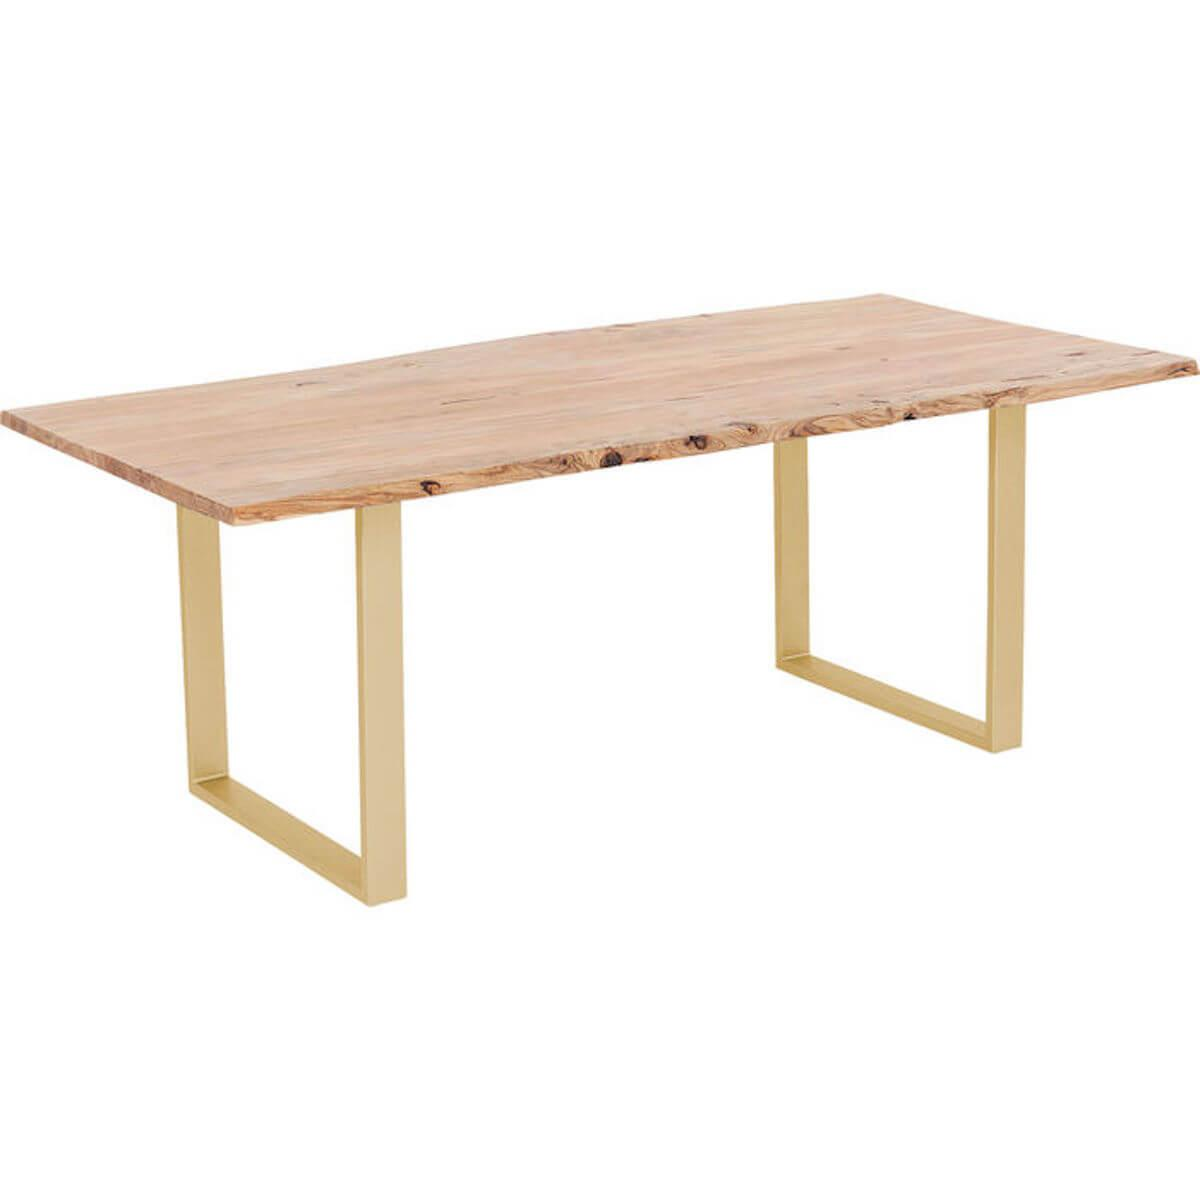 Table 180x90cm HARMONY Kare Design laiton